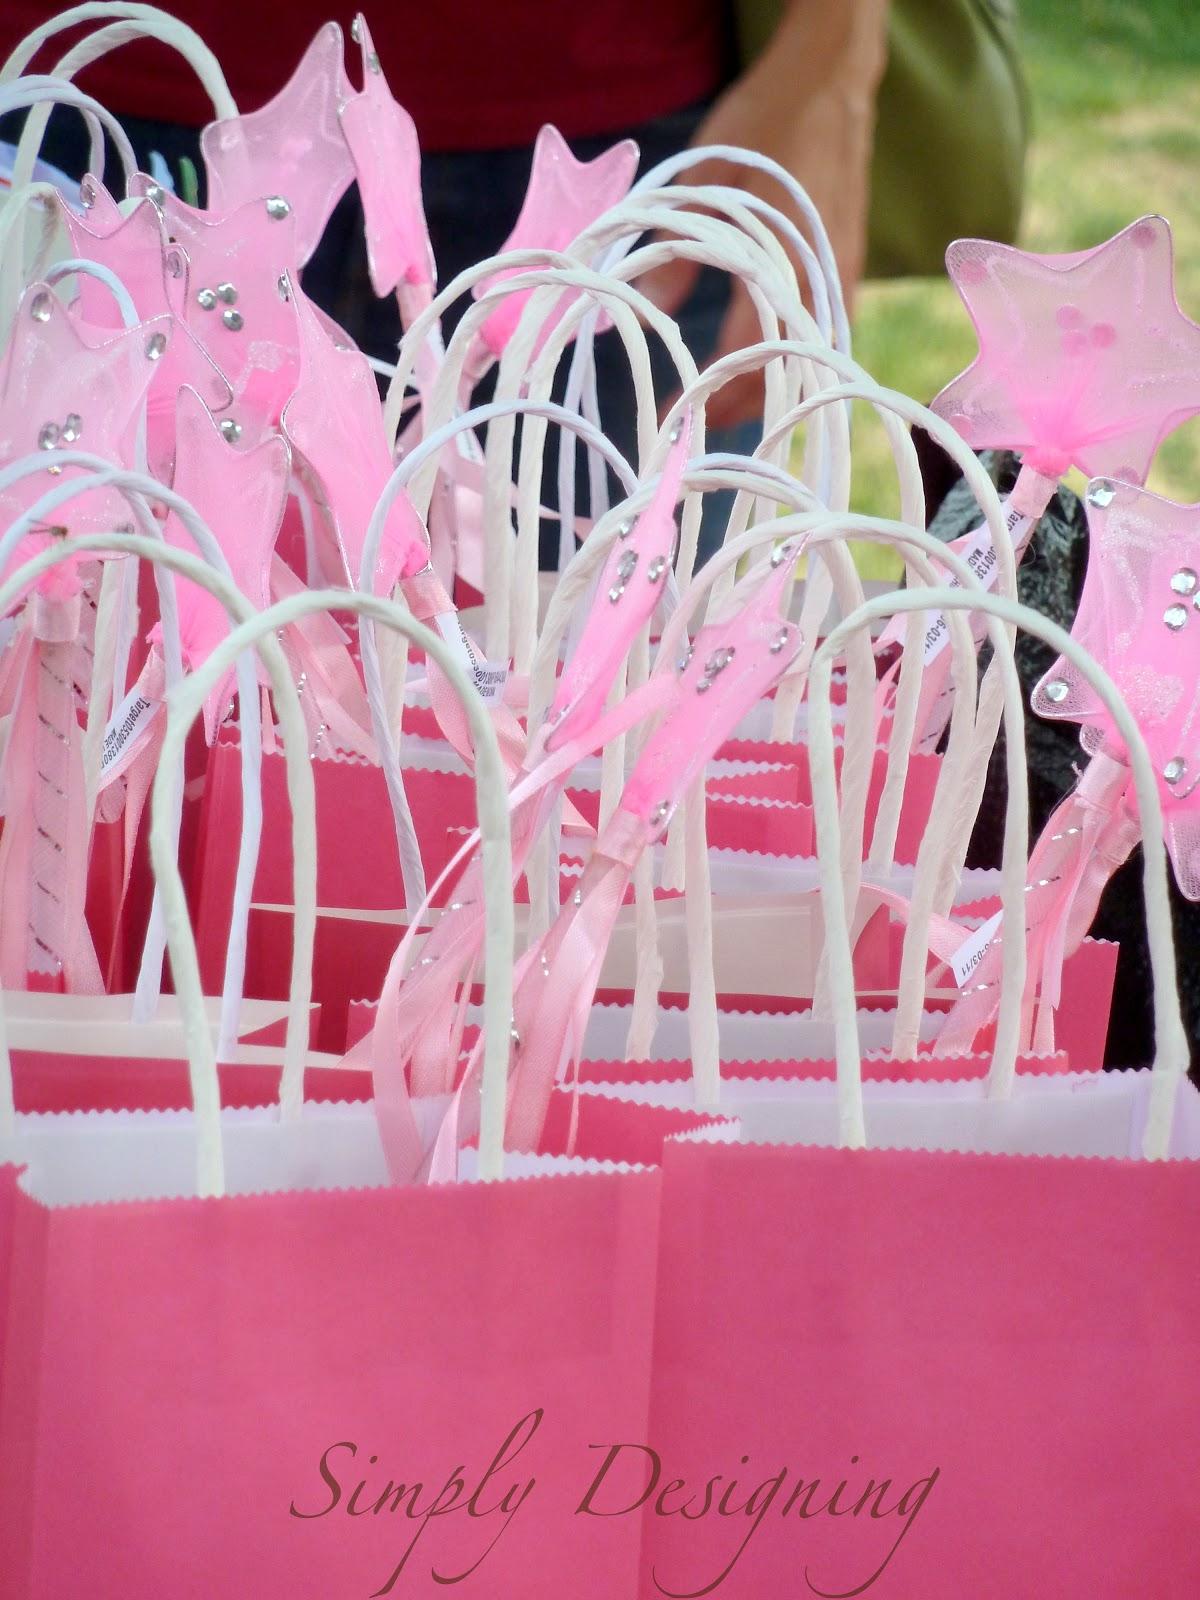 Pinkalicious Party – Pinkalicious Party Invitations